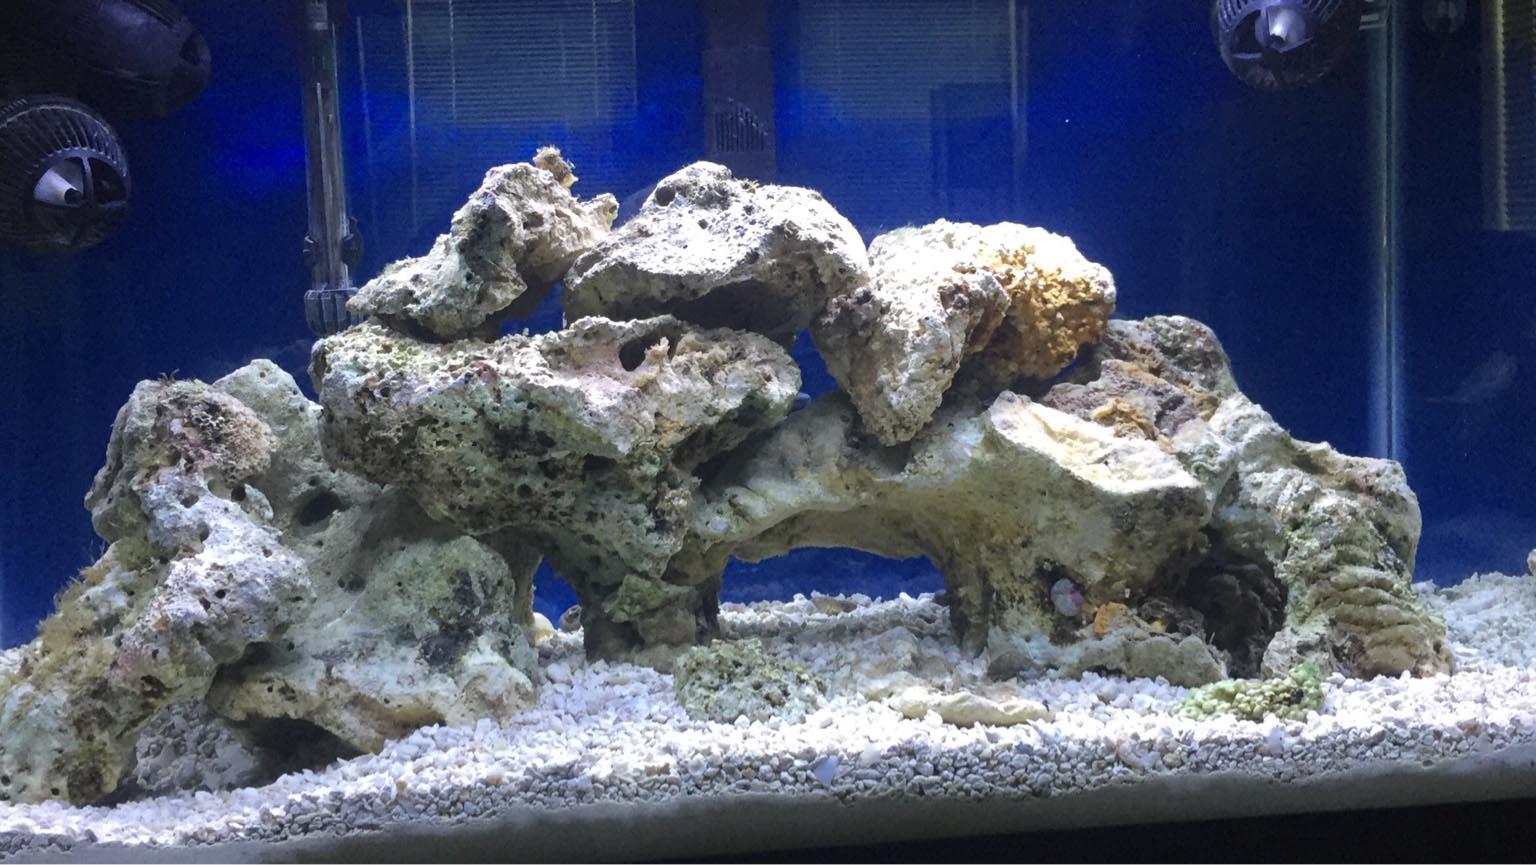 Aquarium and Coral Reef Organization of Sarasota